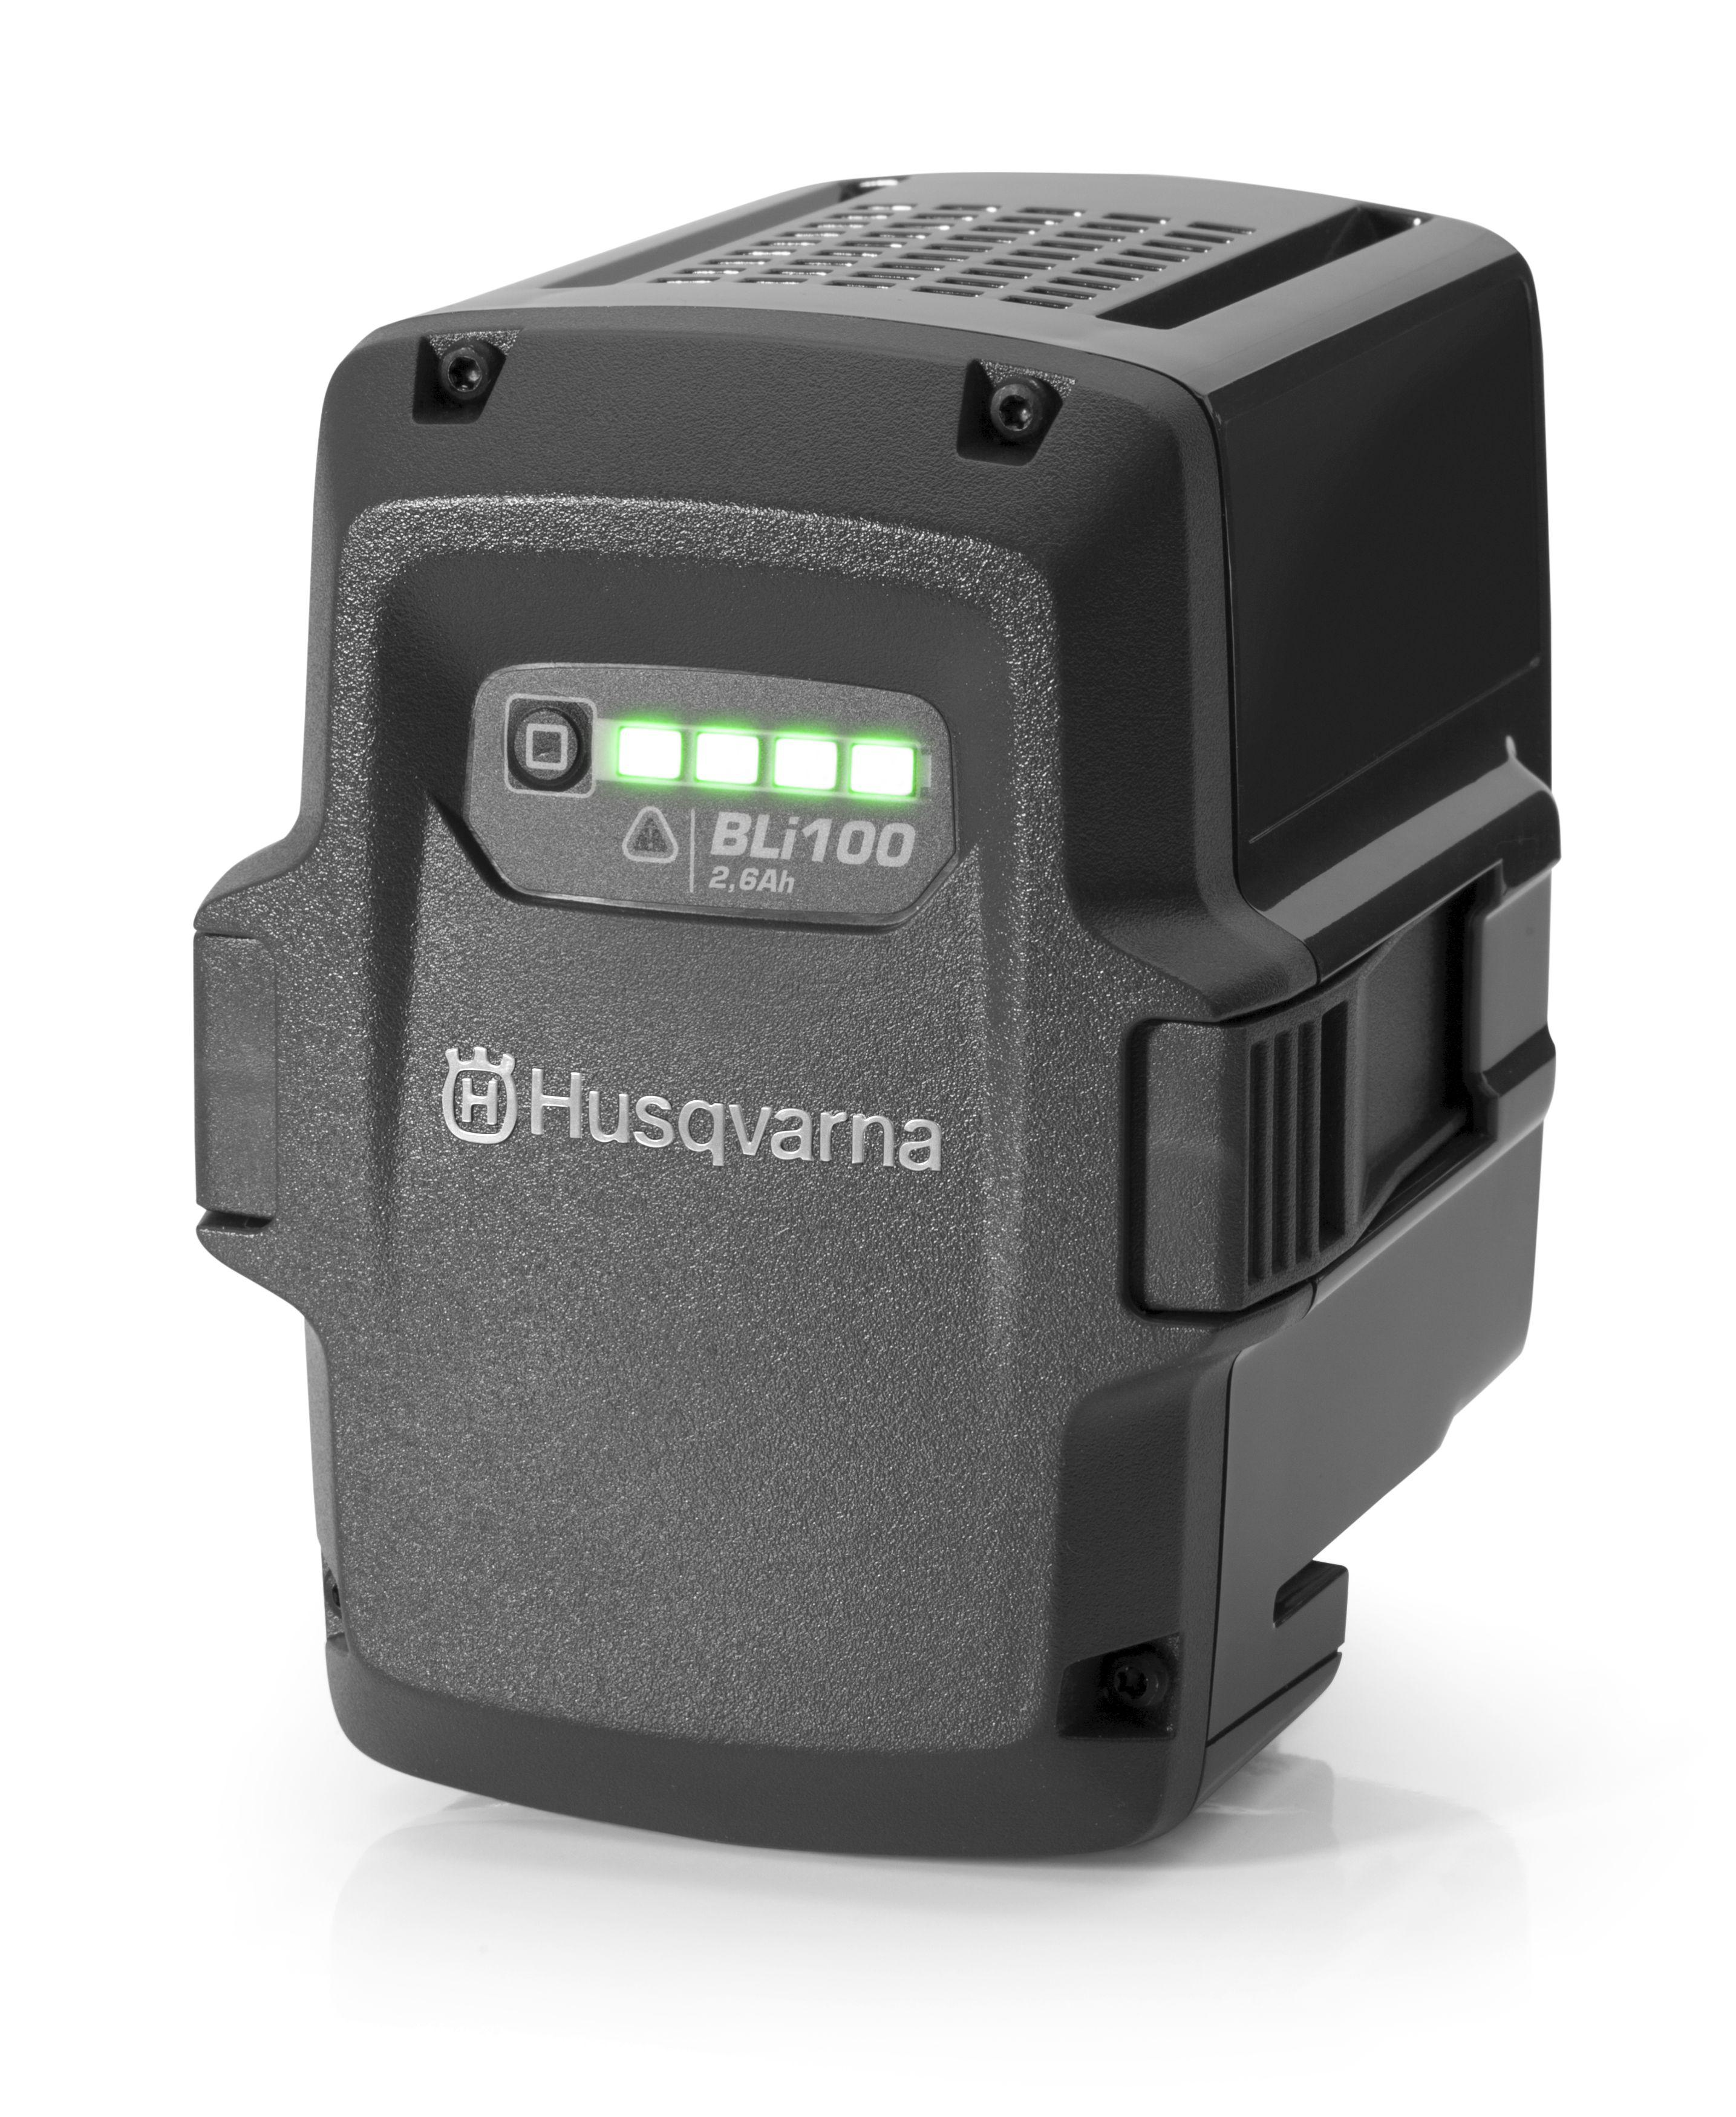 Аккумулятор Husqvarna Bli100 (9670918-01) аккумулятор husqvarna 9667760 01